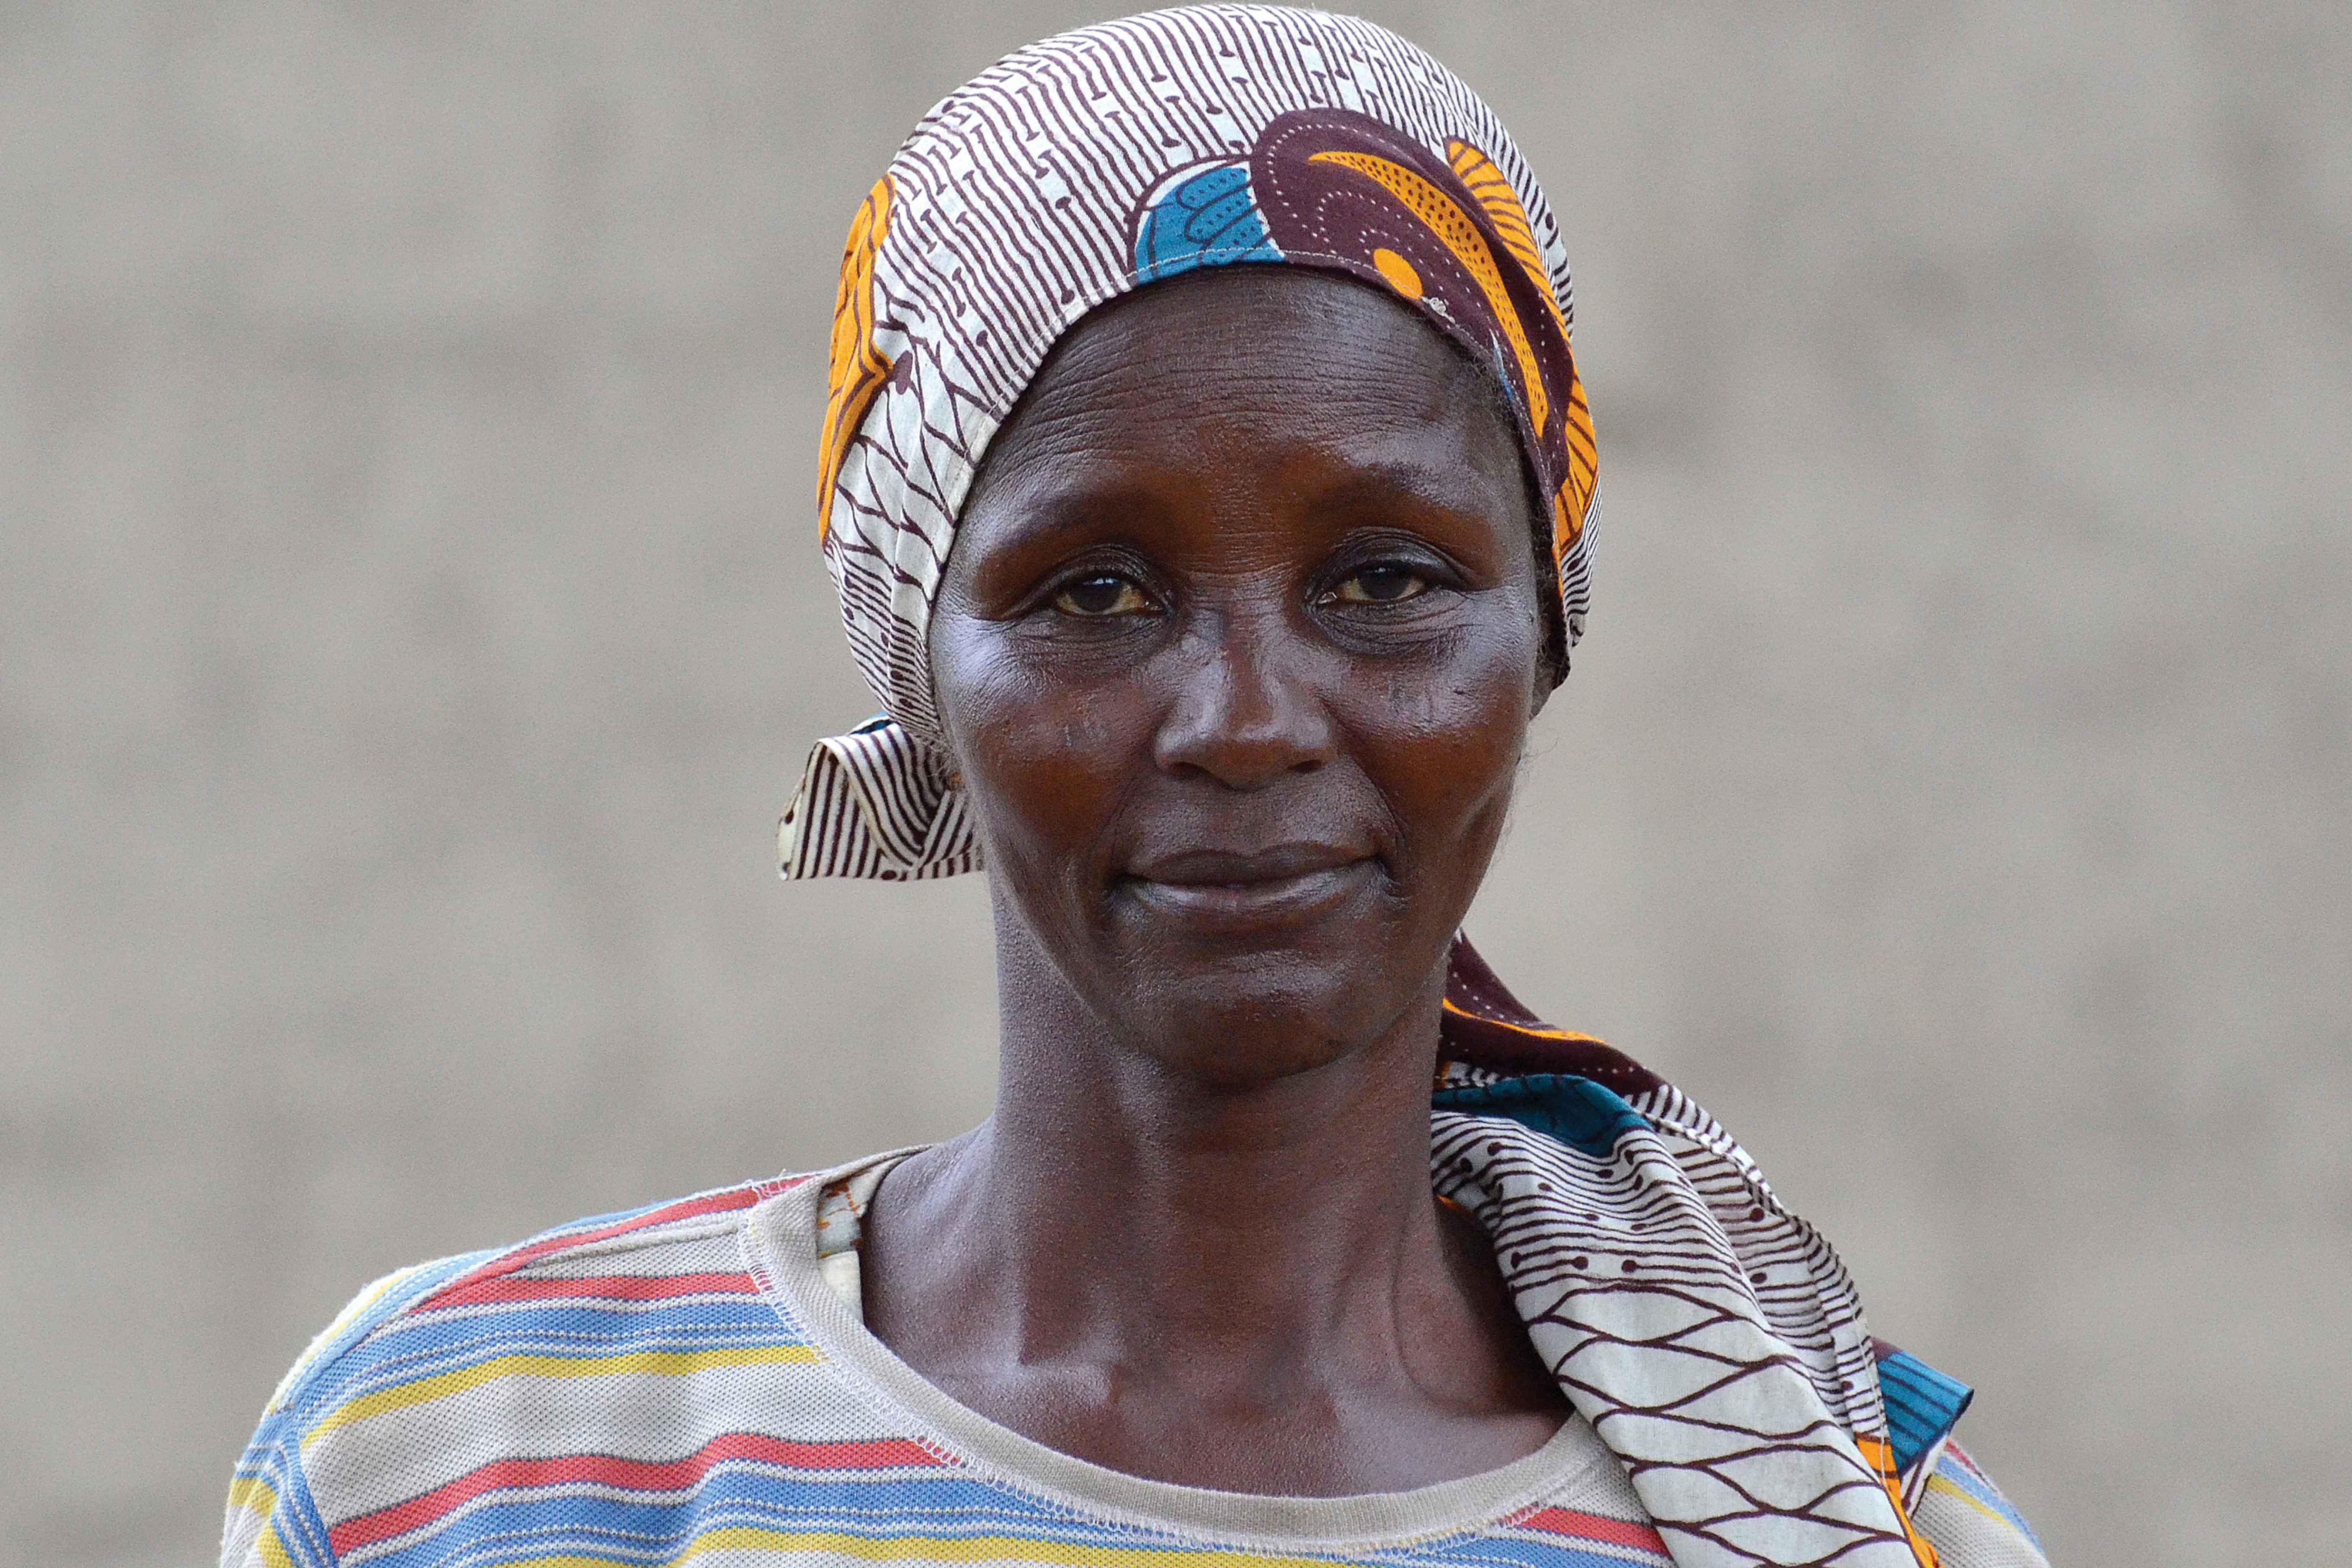 Mama Portrait